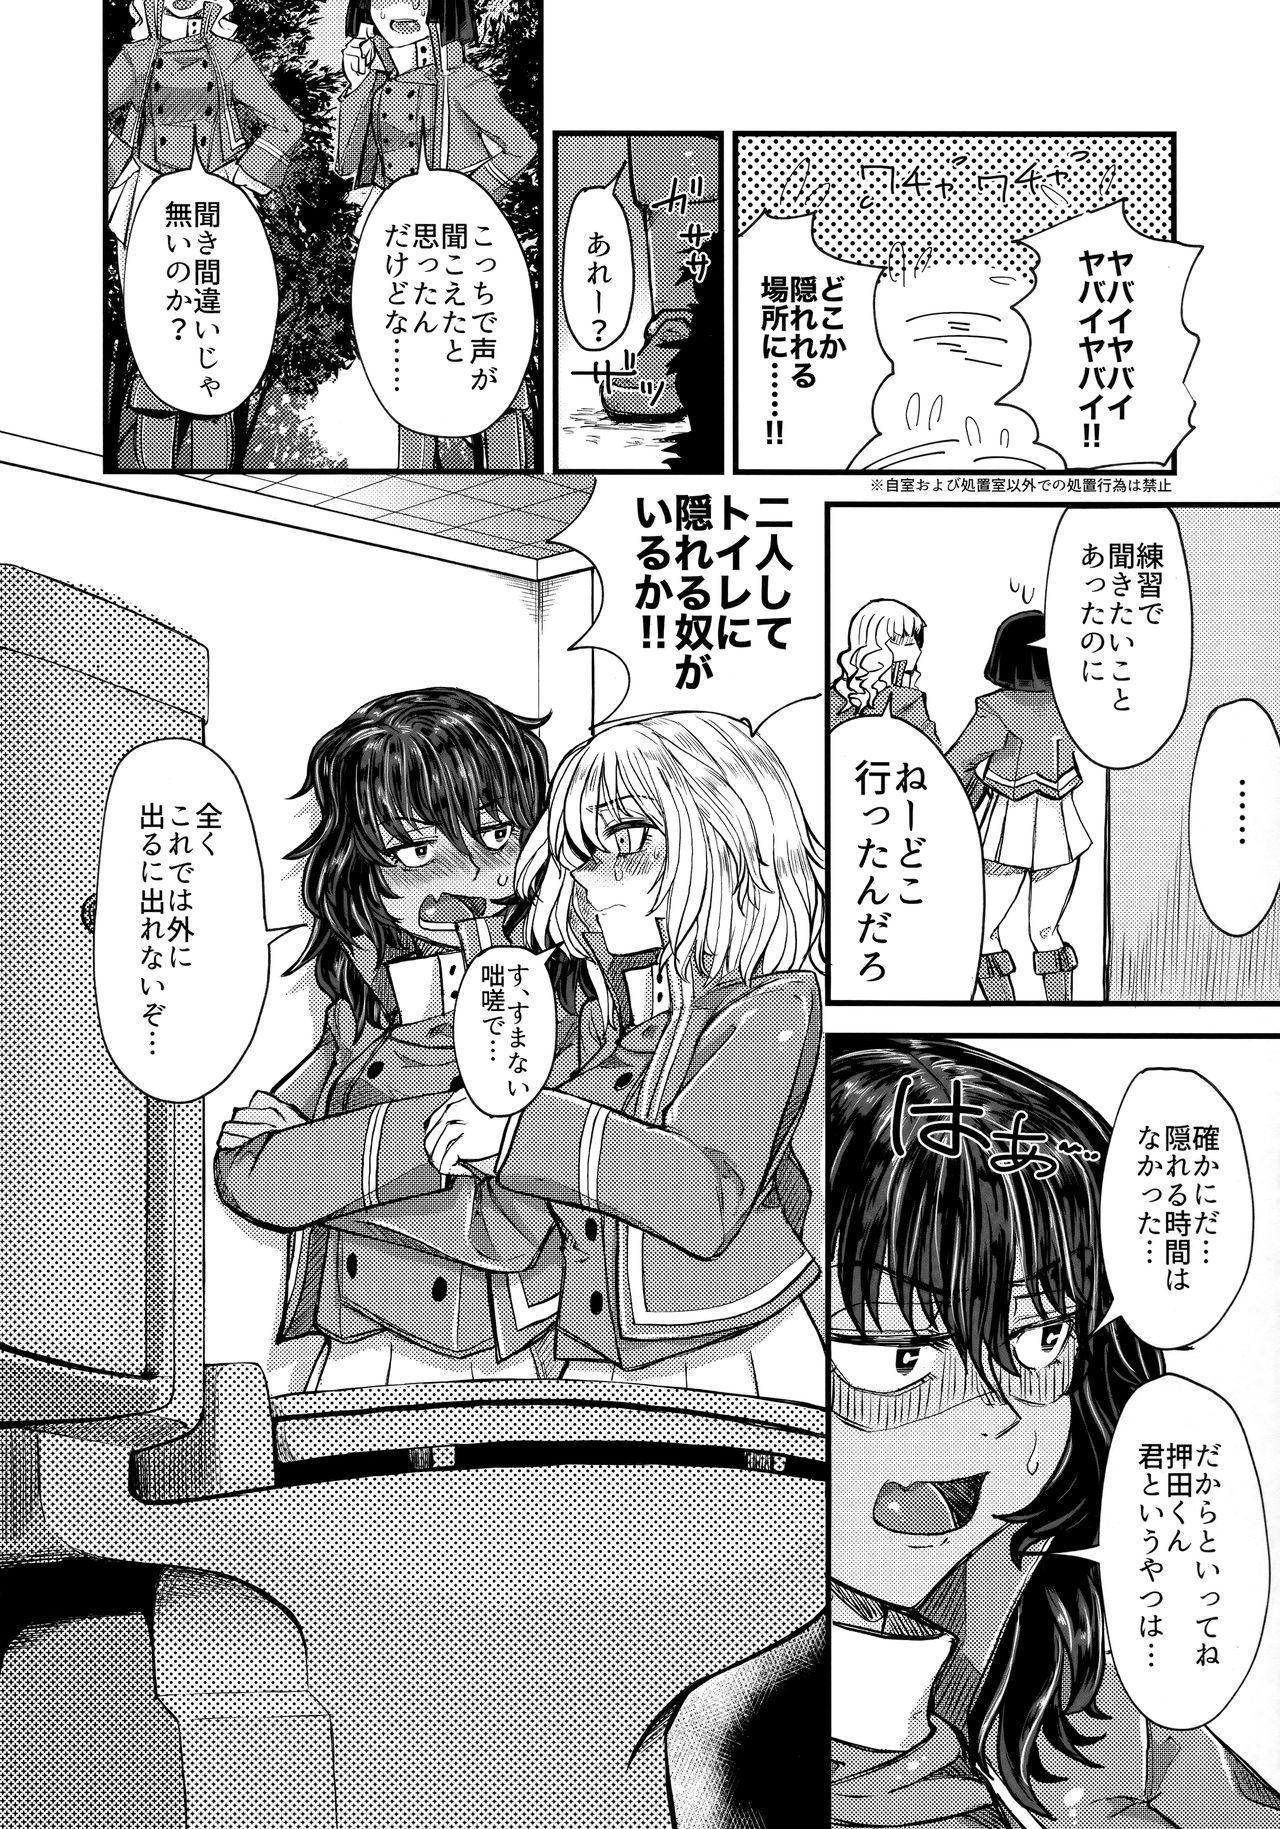 Kimi o Aishitai. 10